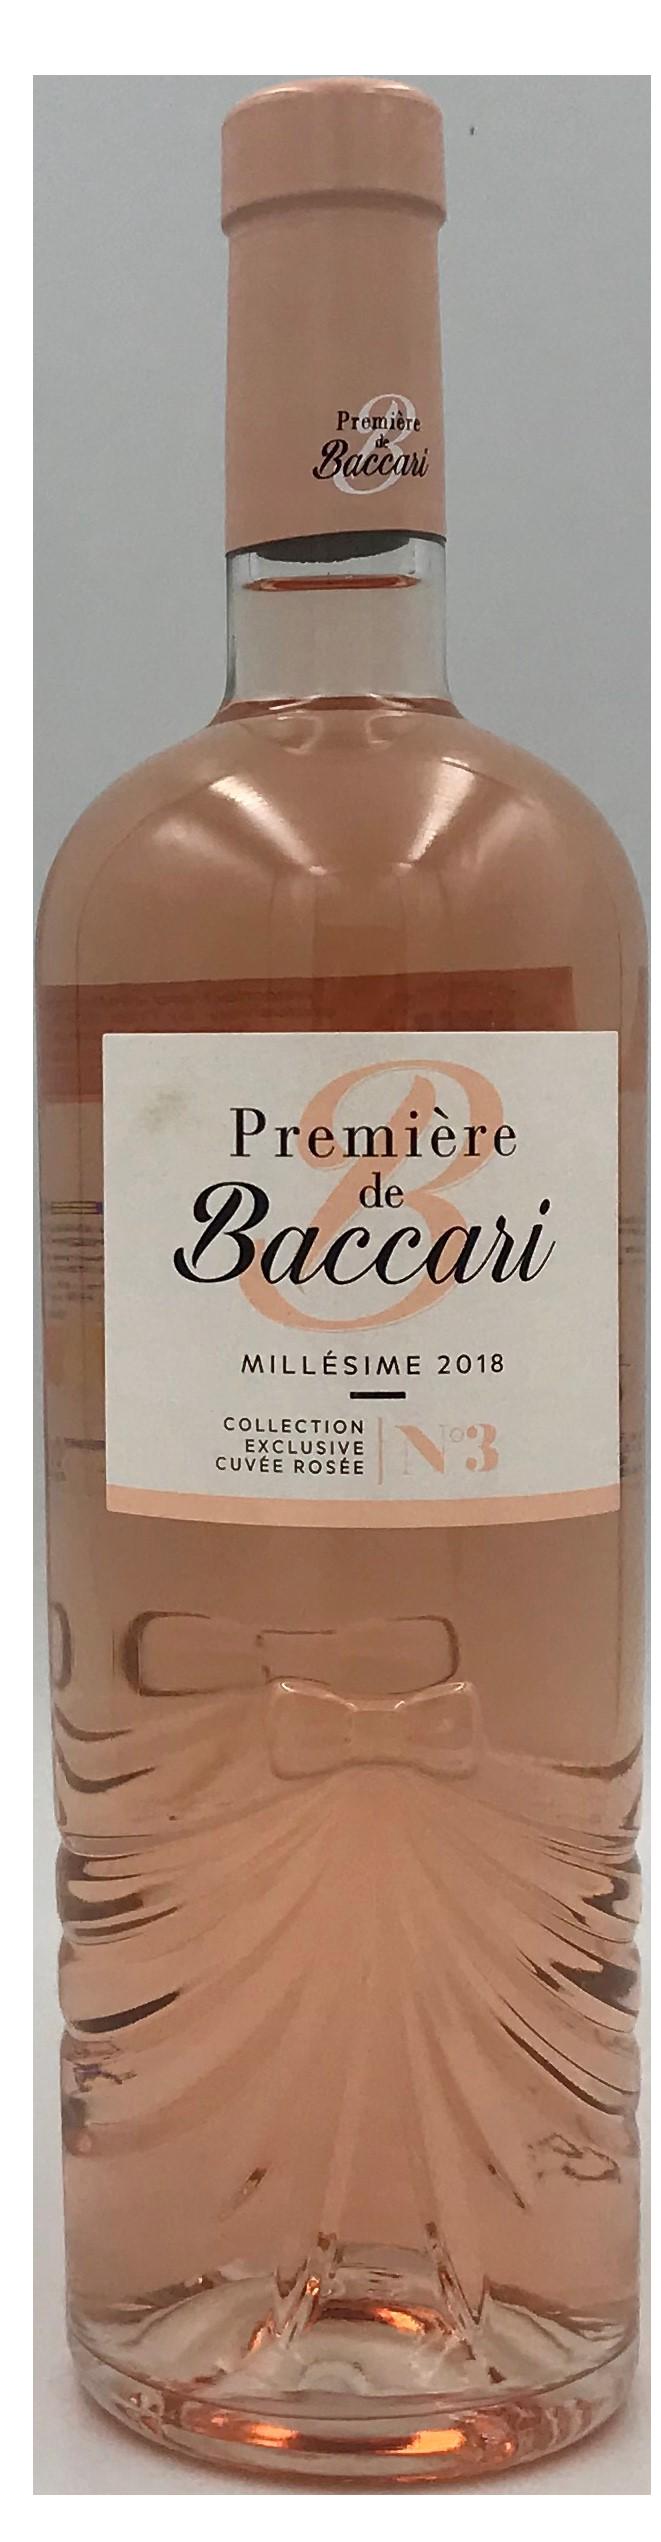 Première de Baccari No. 3 (Cinsault, Grenache, Syrah)